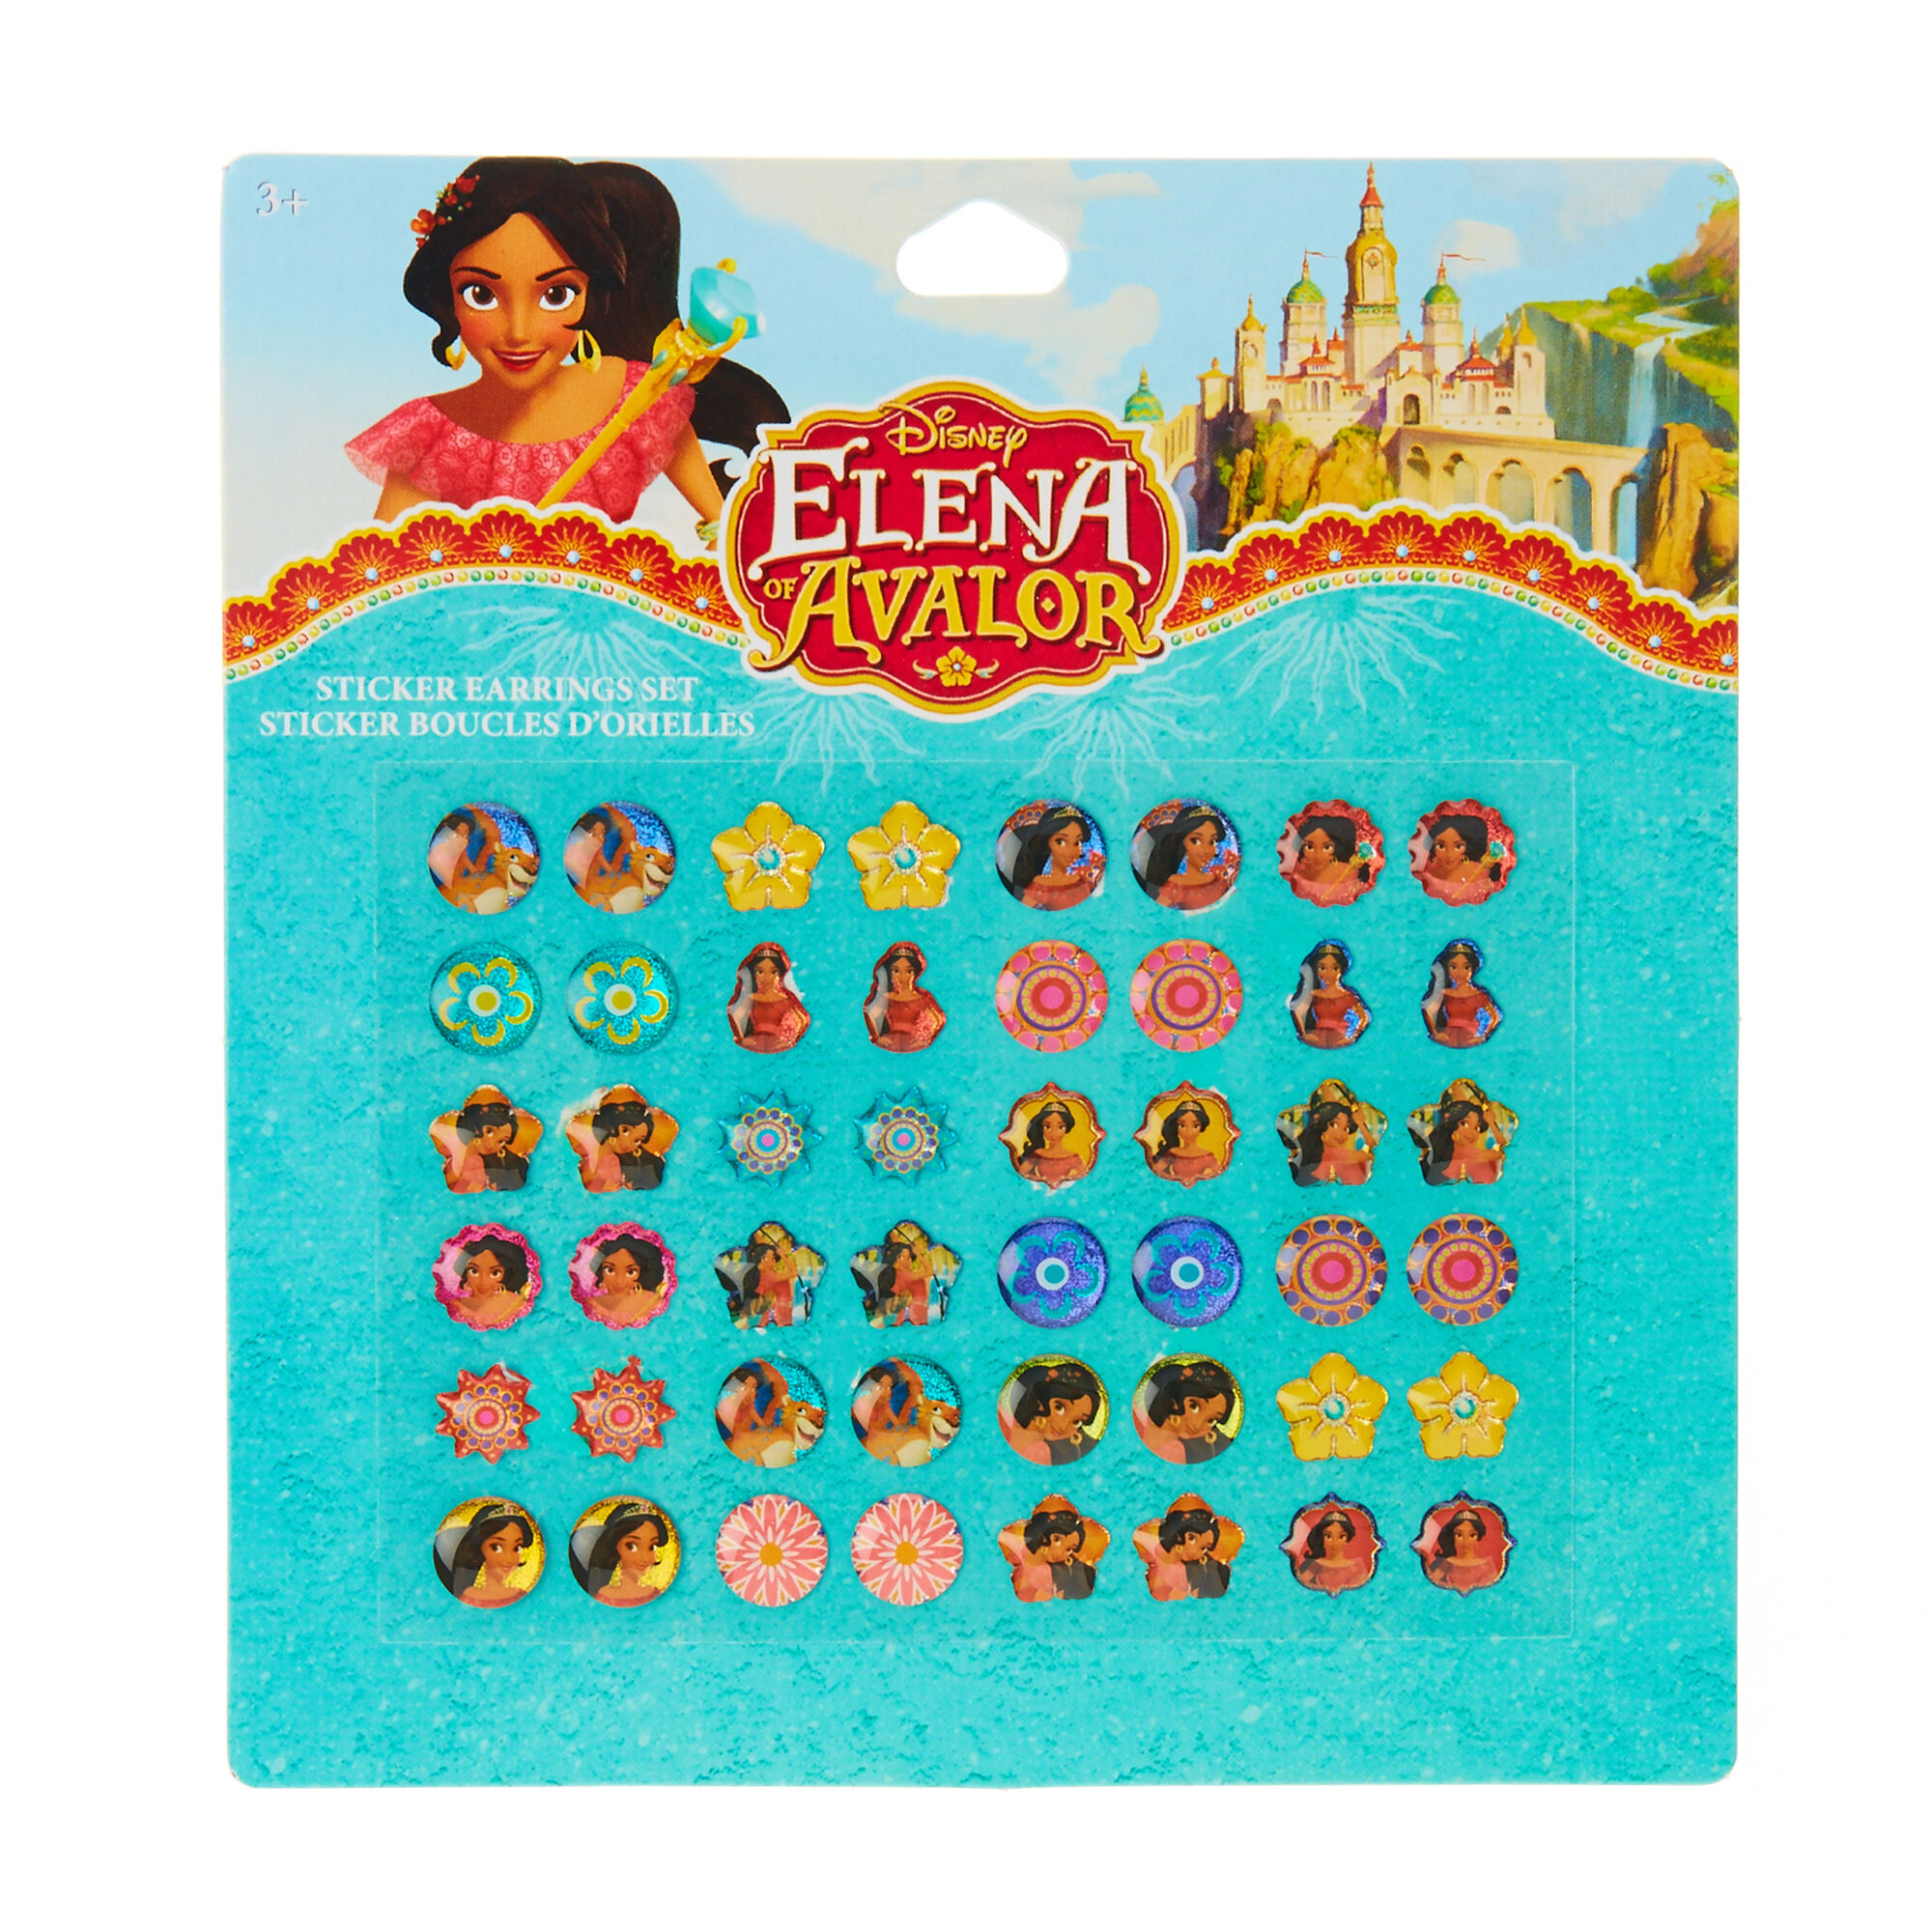 Disney Princess Elena of Avalor Sticker Earrings